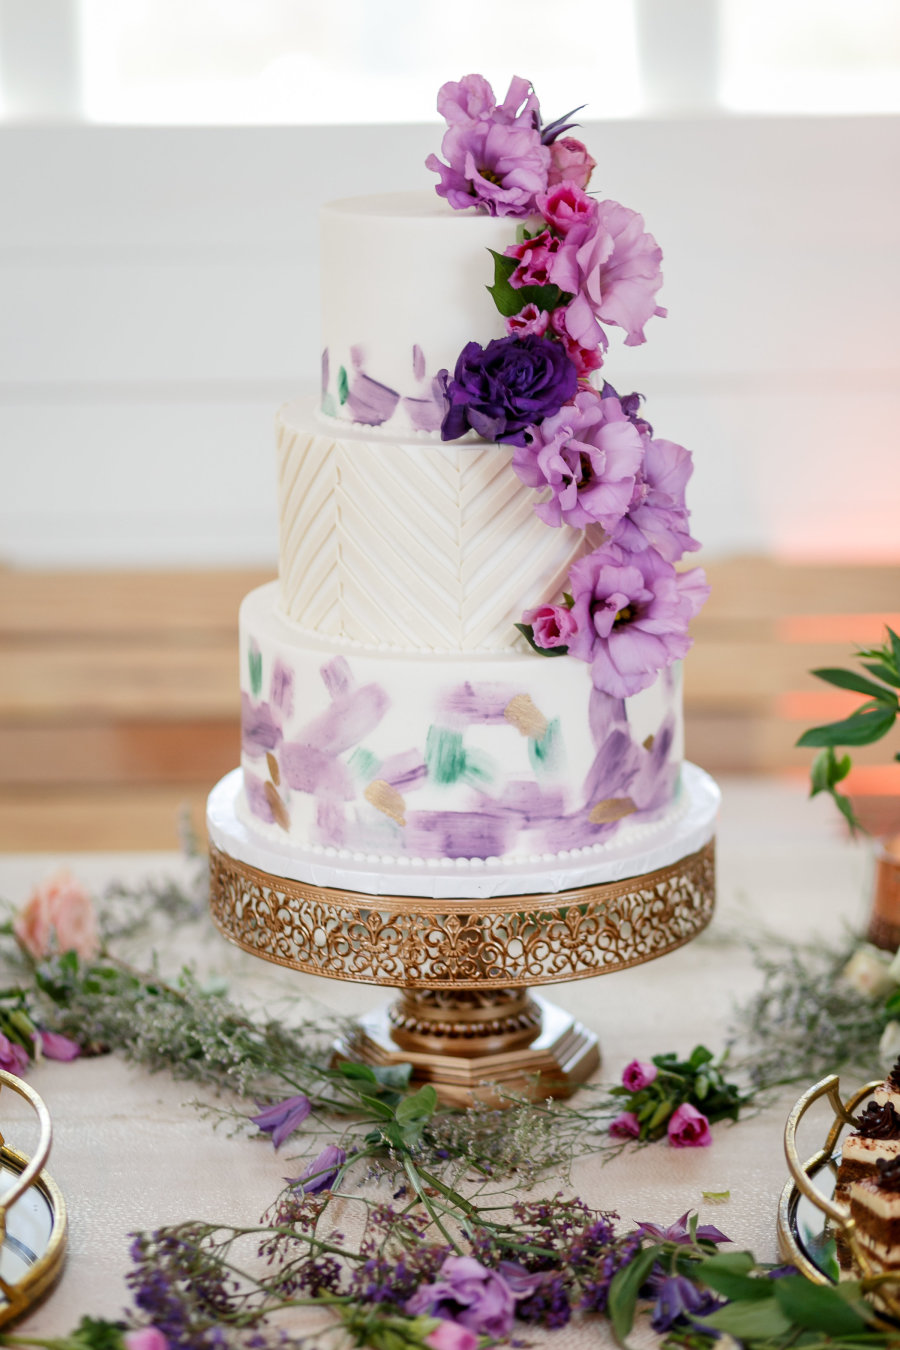 purple-and-white wedding cake